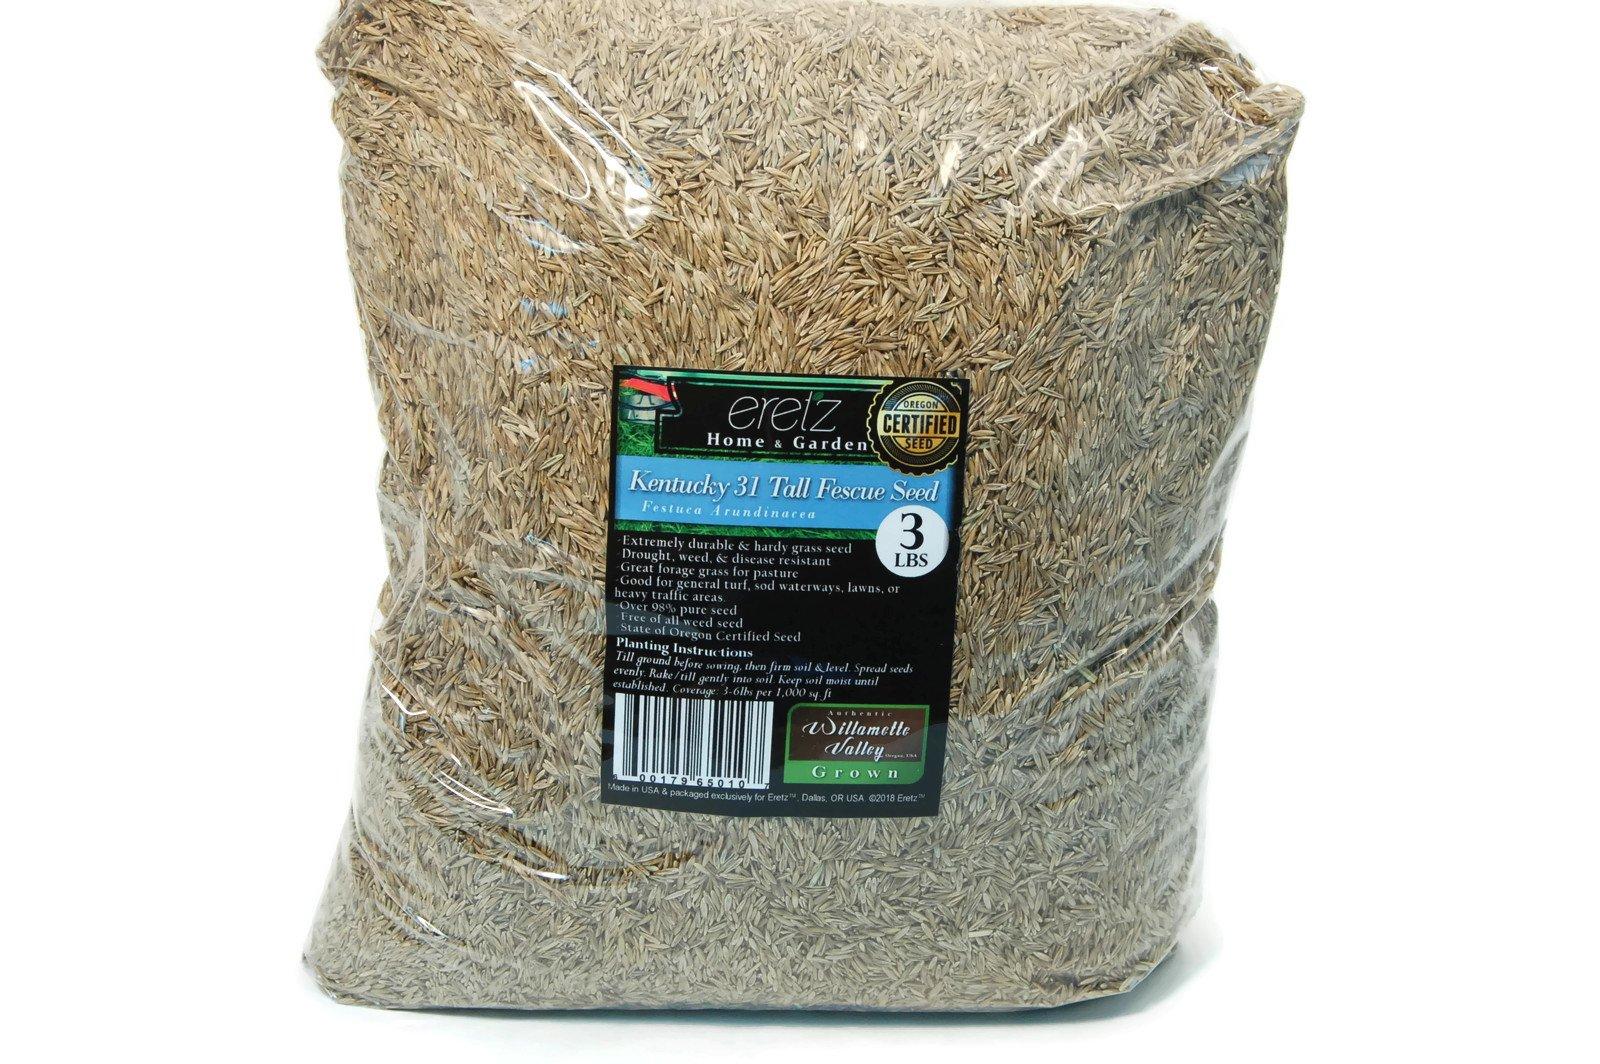 Kentucky 31 Tall Fescue Grass Seed by Eretz - Willamette Valley, Oregon Grown (3lbs)